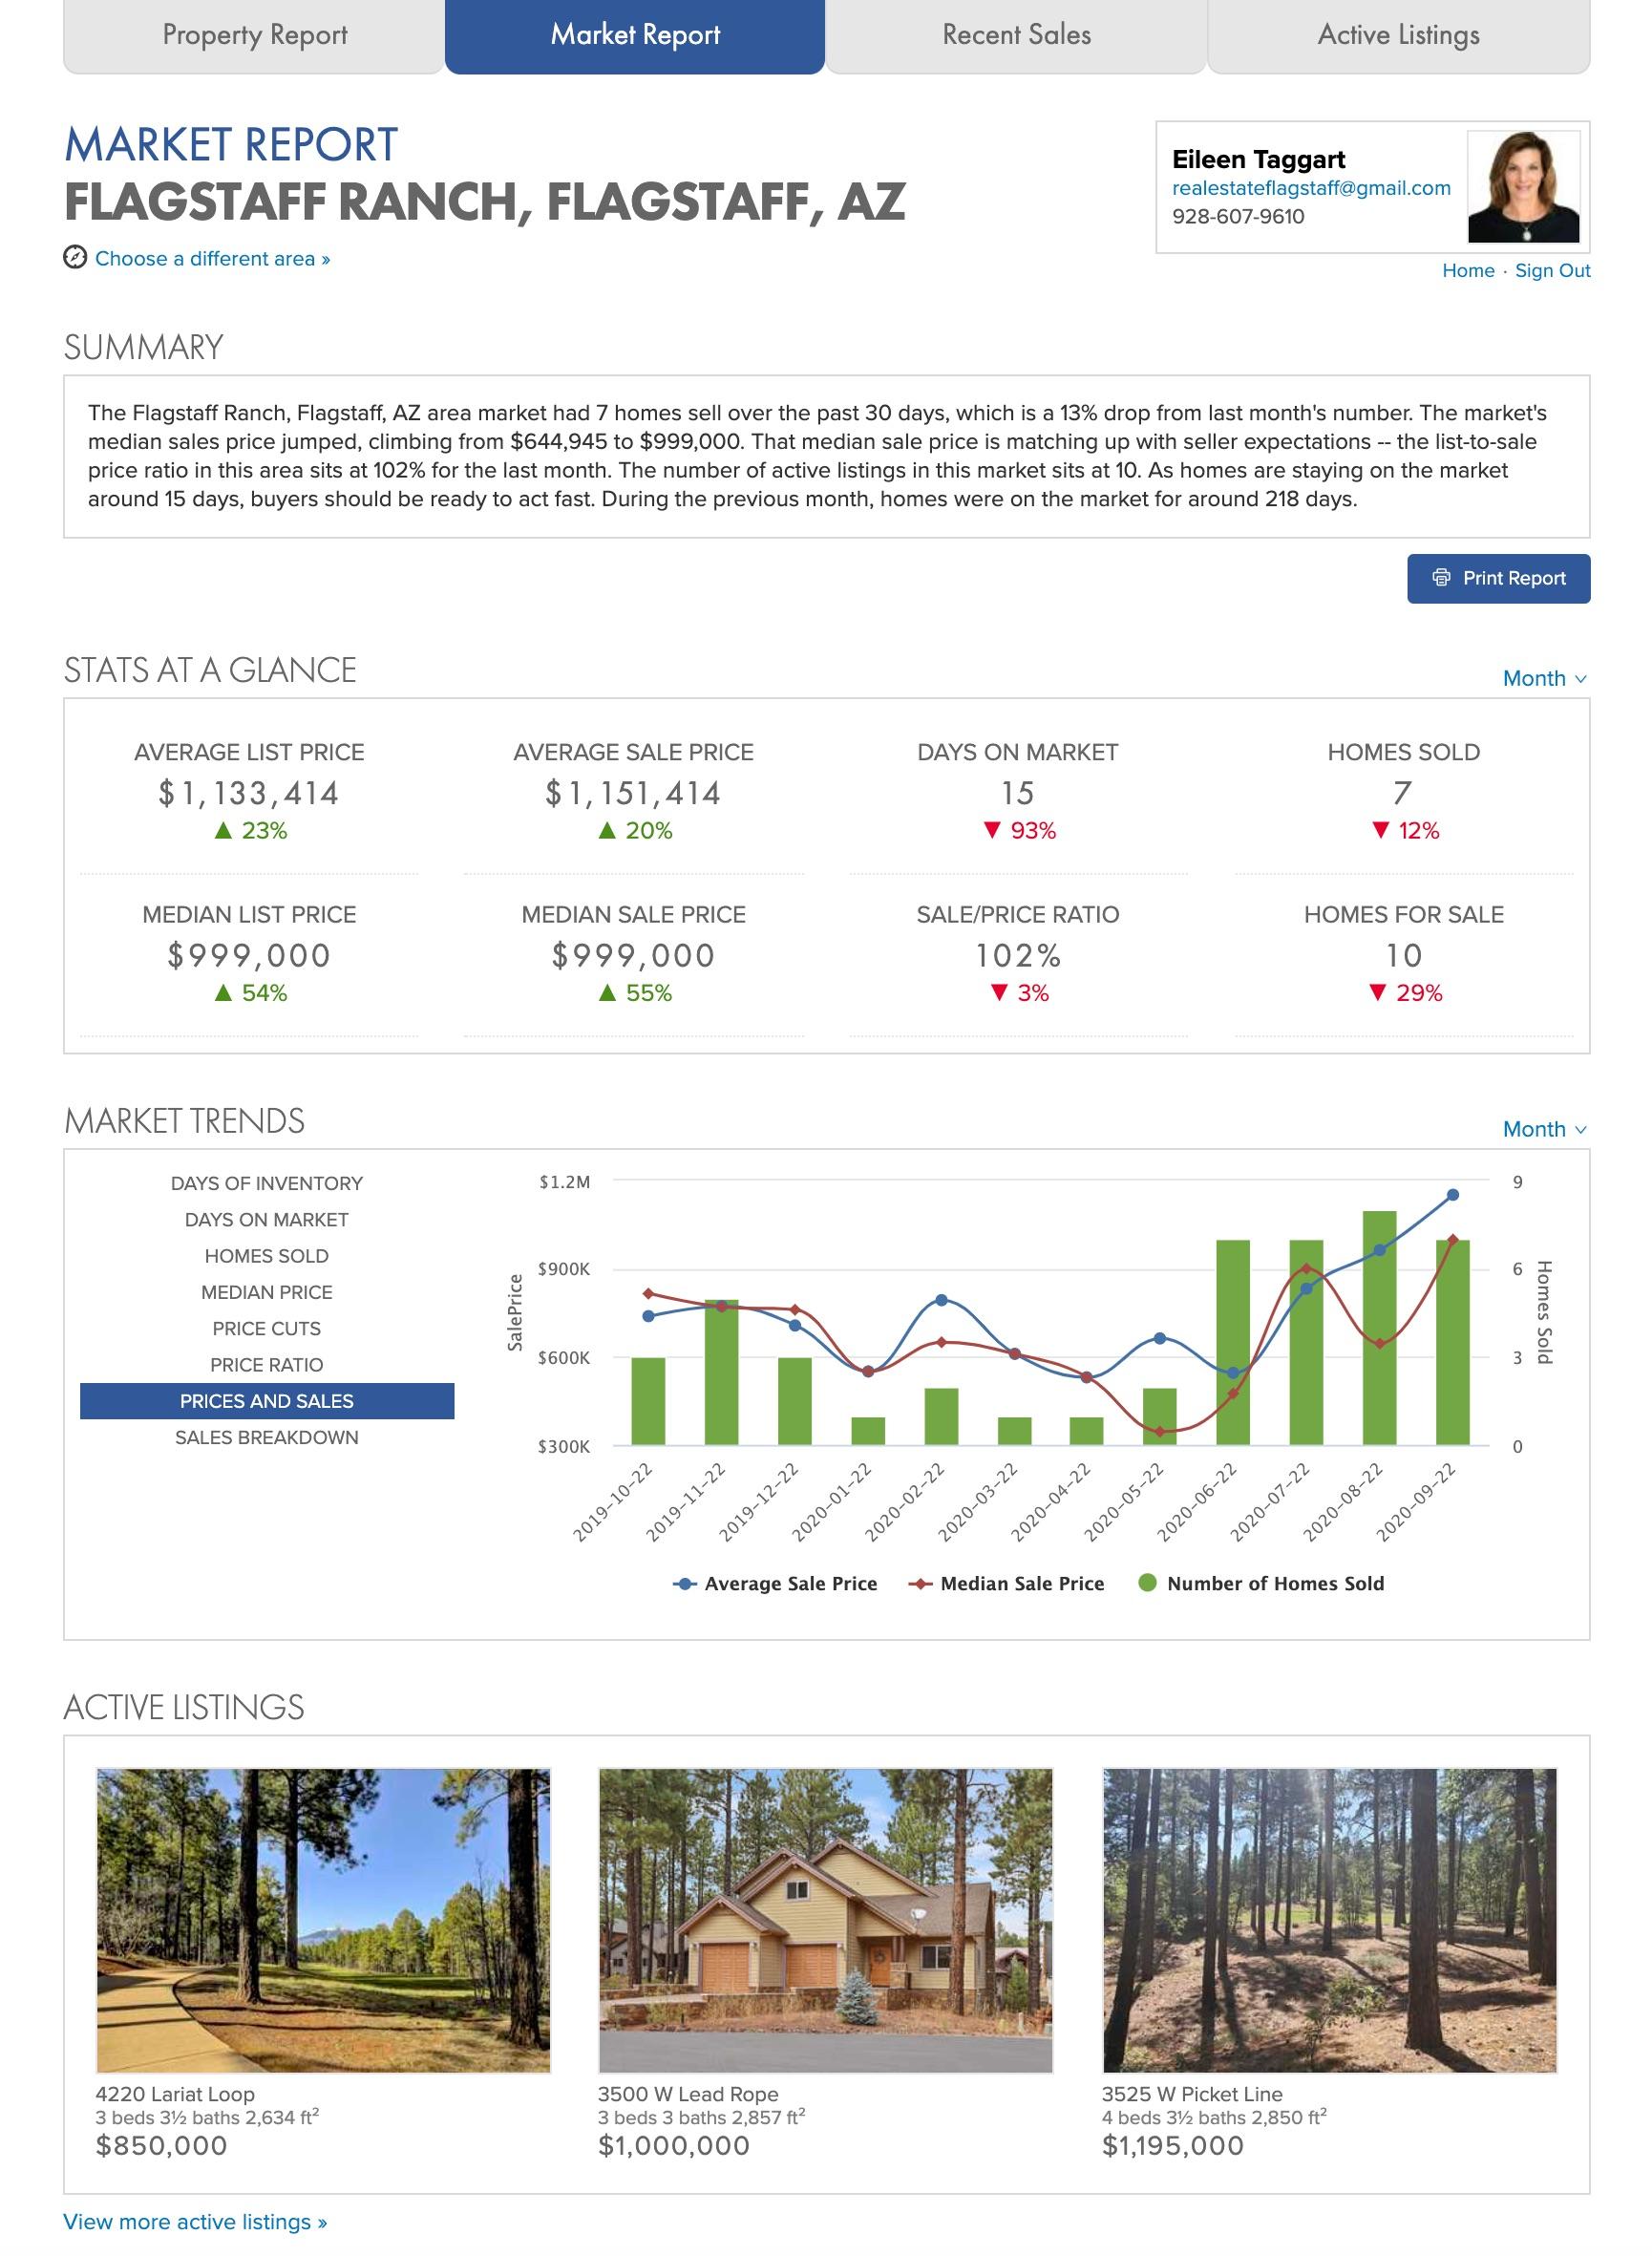 Flagstaff Ranch Weekly Report